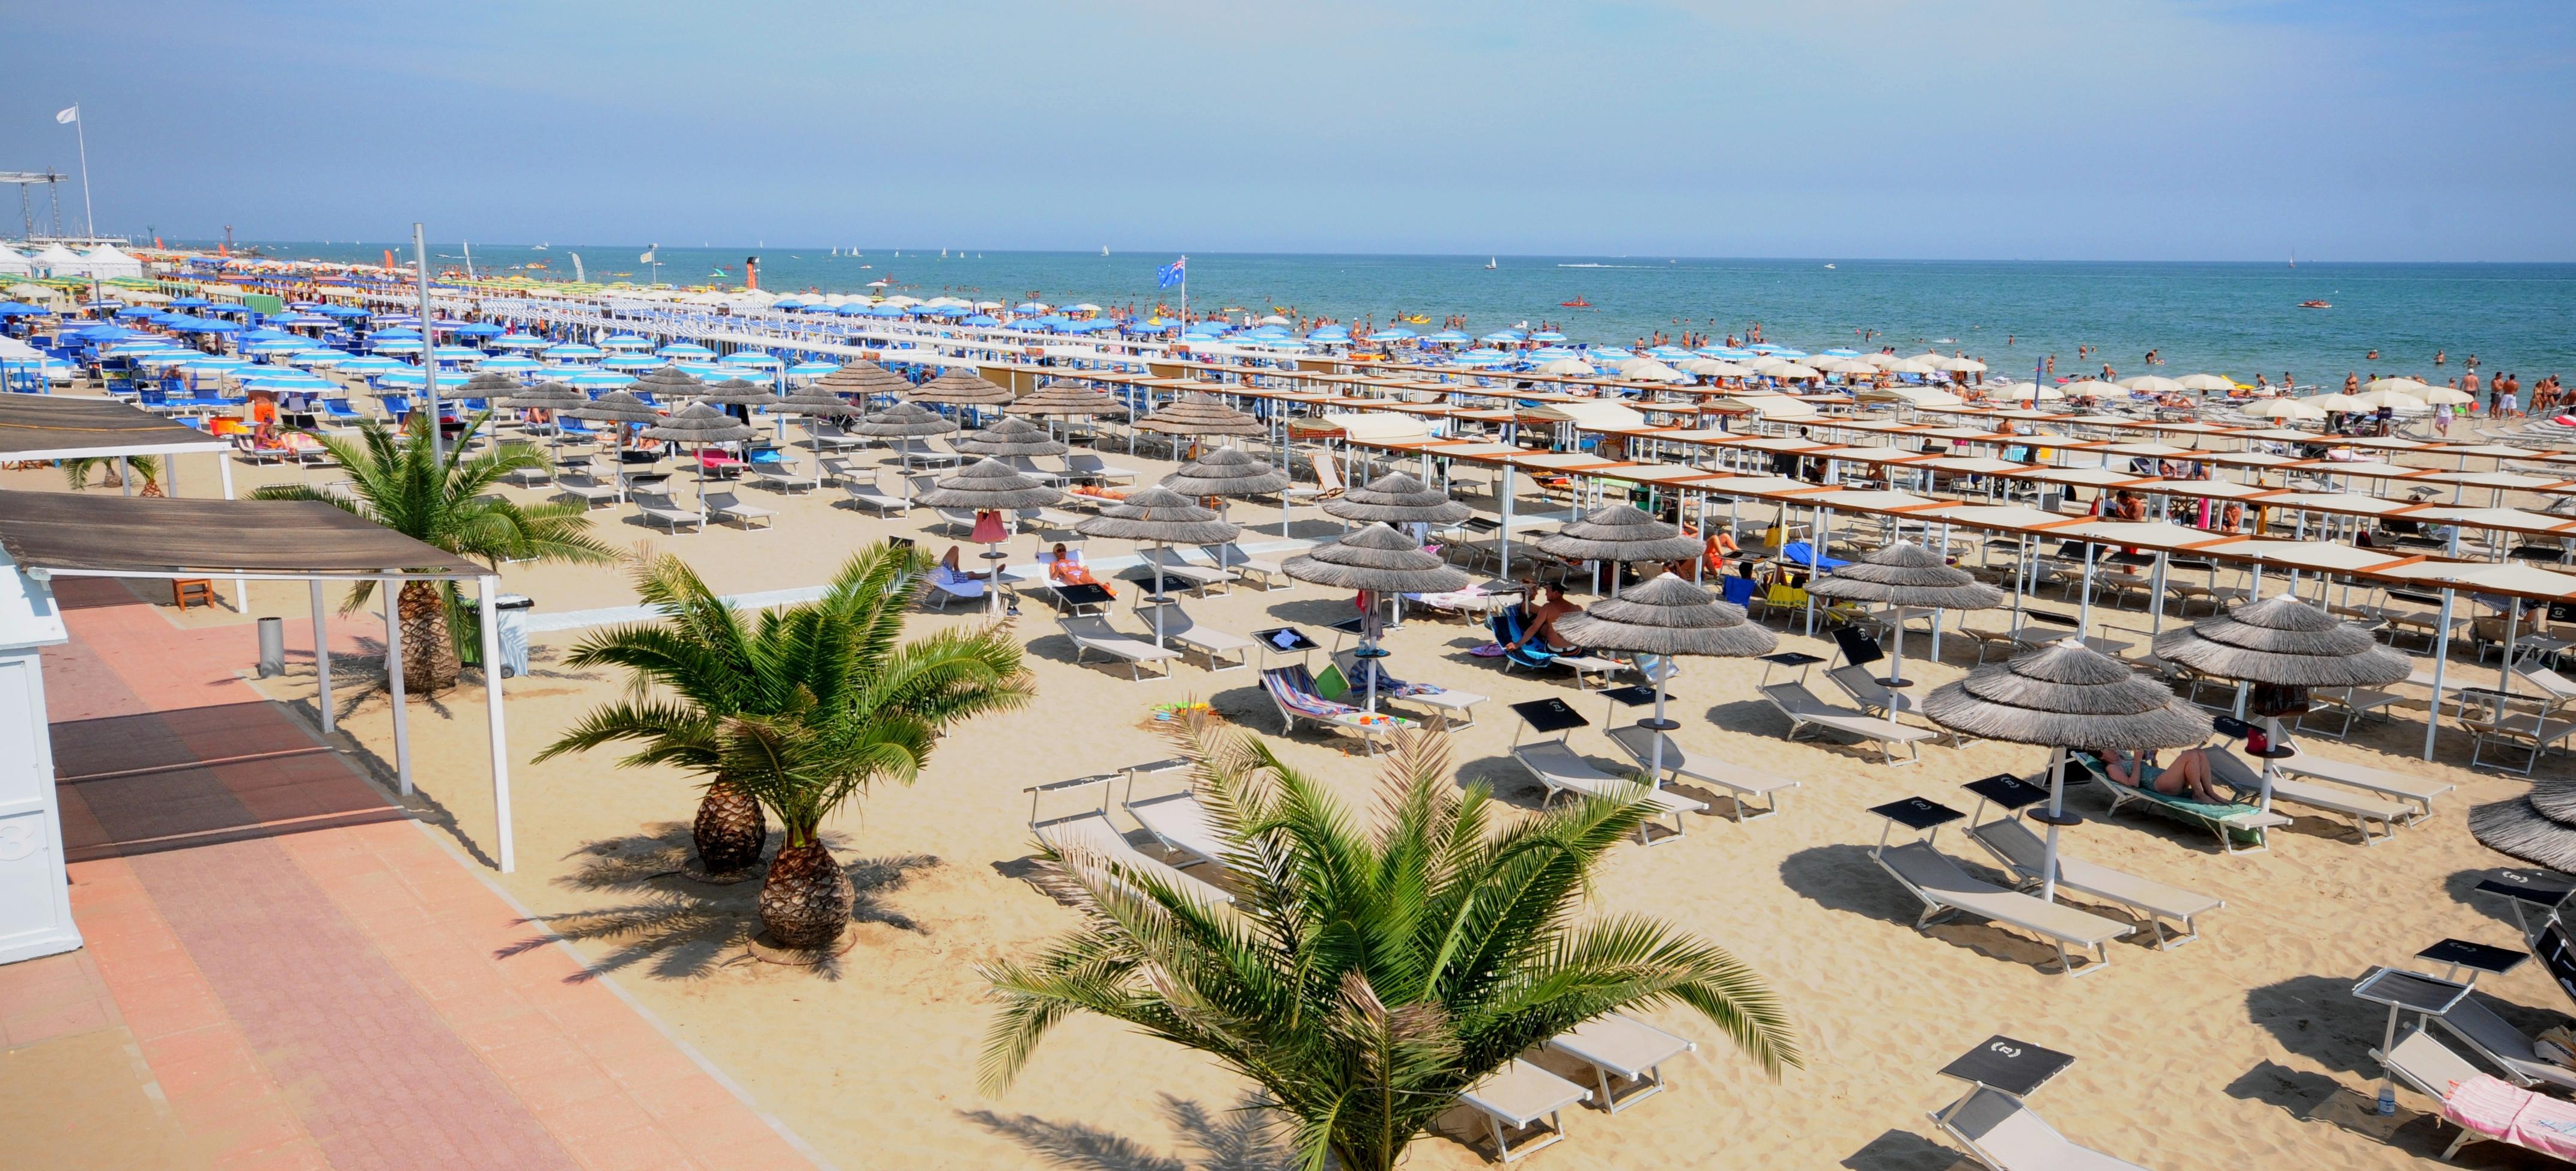 Big spiaggia6